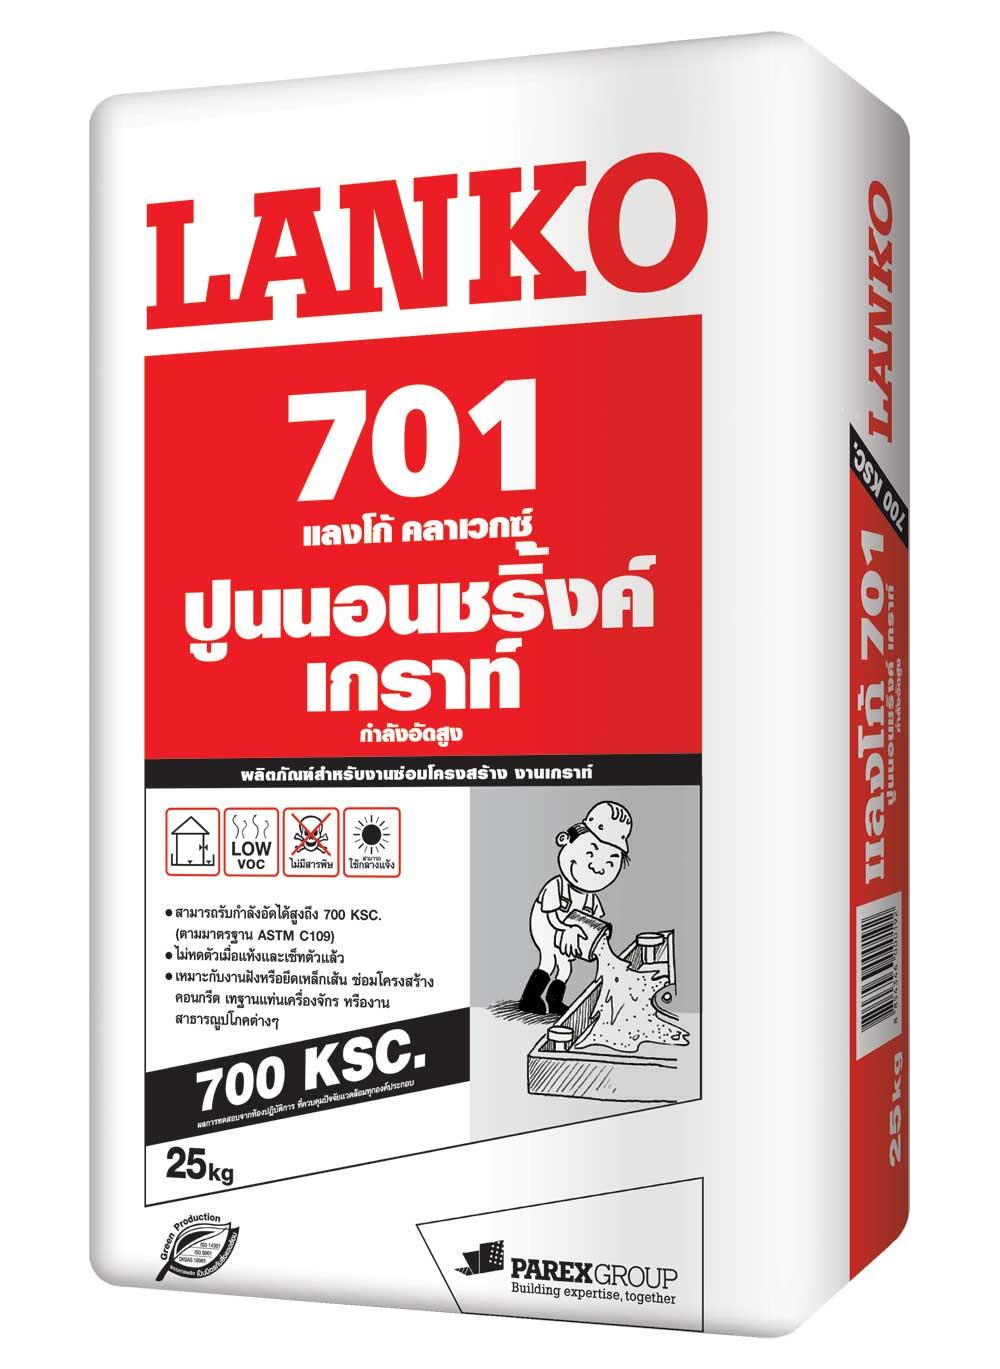 LANKO 701 CLAVEX ปูนนอนชริ๊งค์เกราท์ รับกำลังอัดสูง